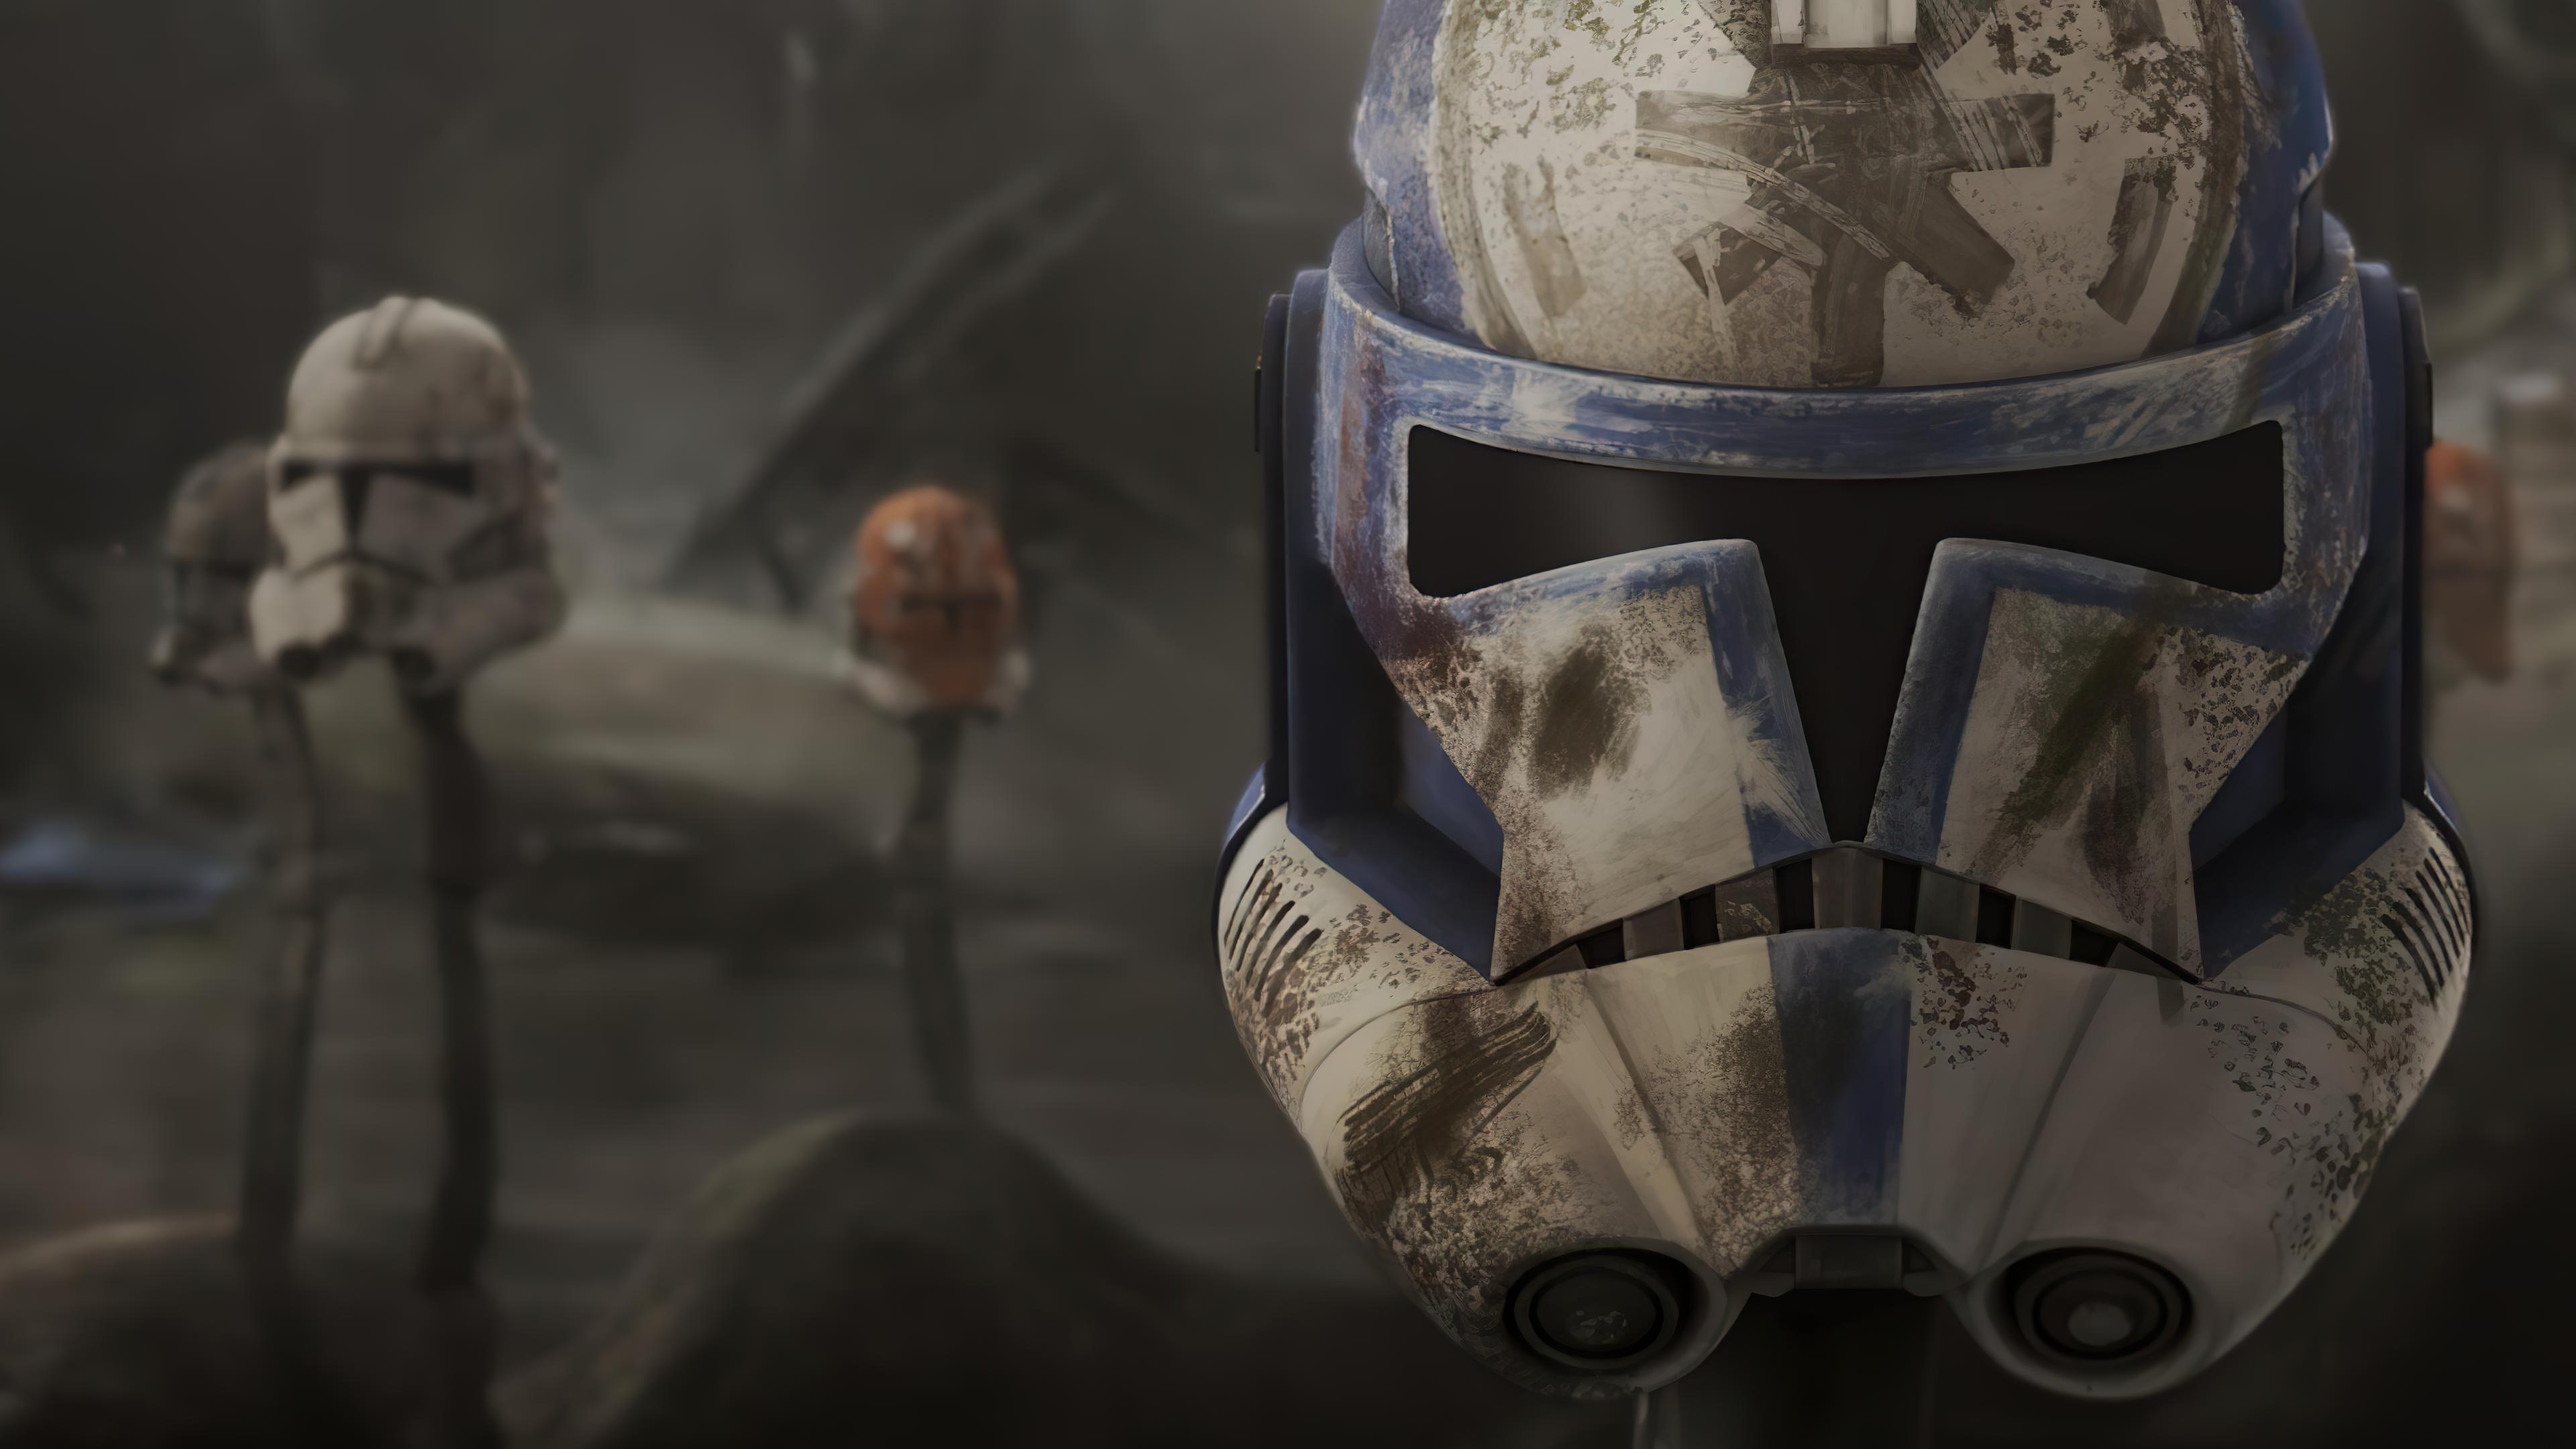 Clone Wars Finale 3840x2160 Download Hd Wallpaper Wallpapertip